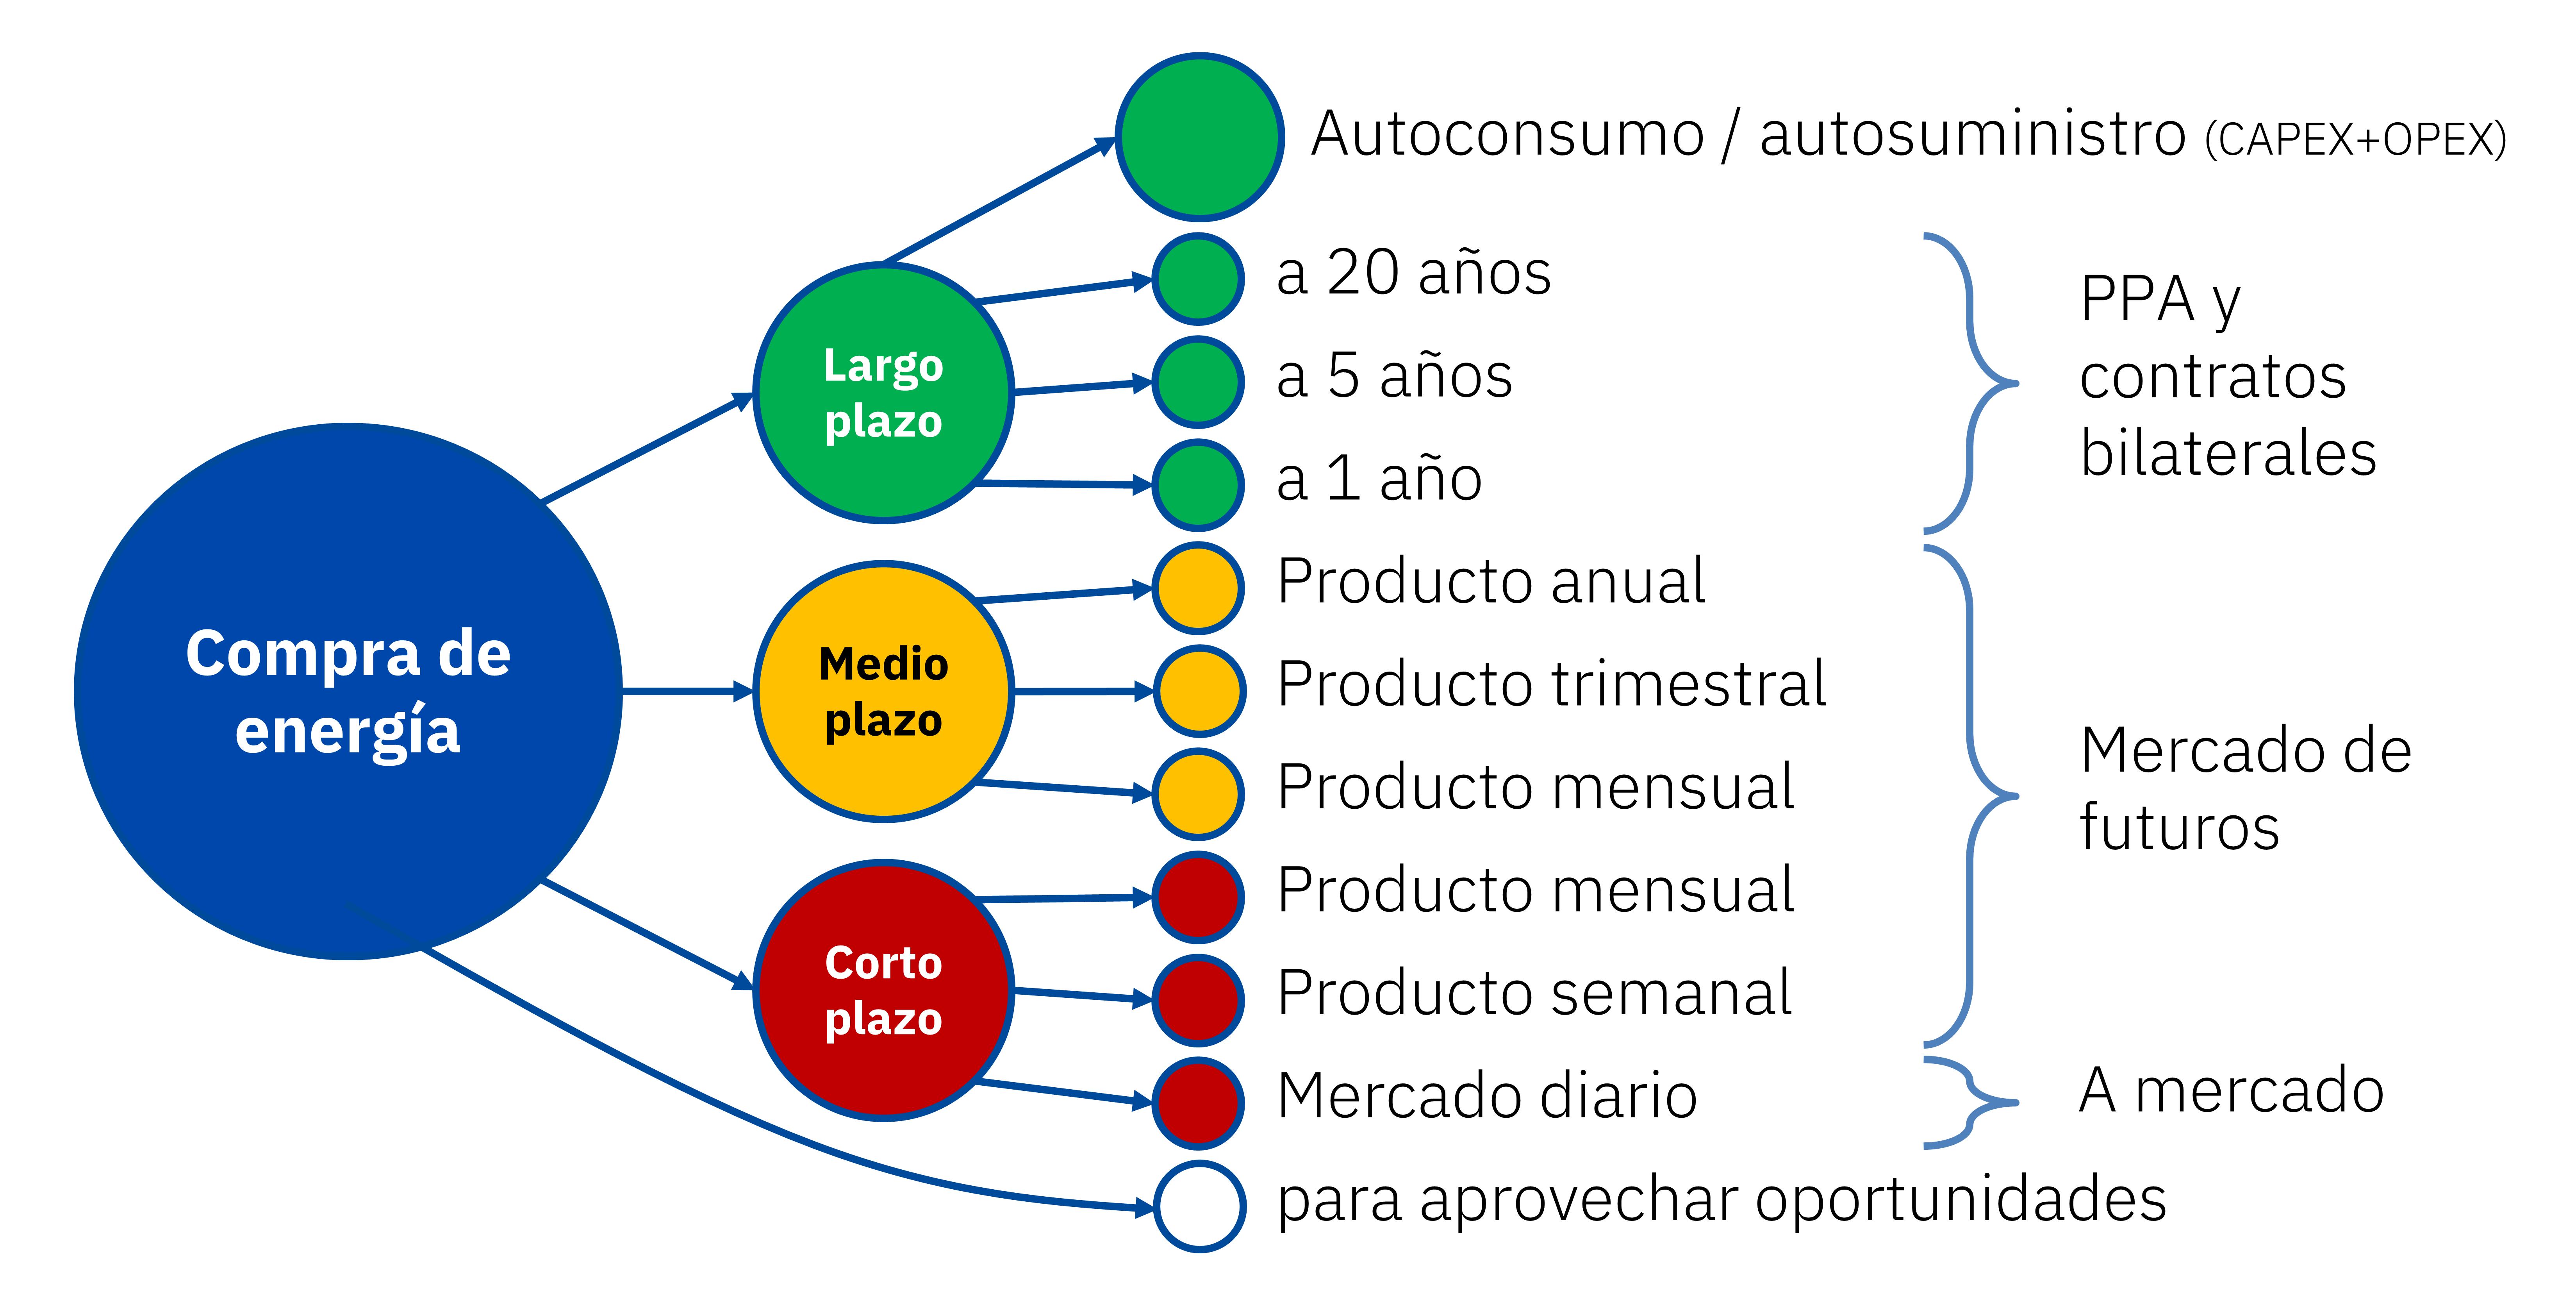 AleaSoft - Estrategia compra energia